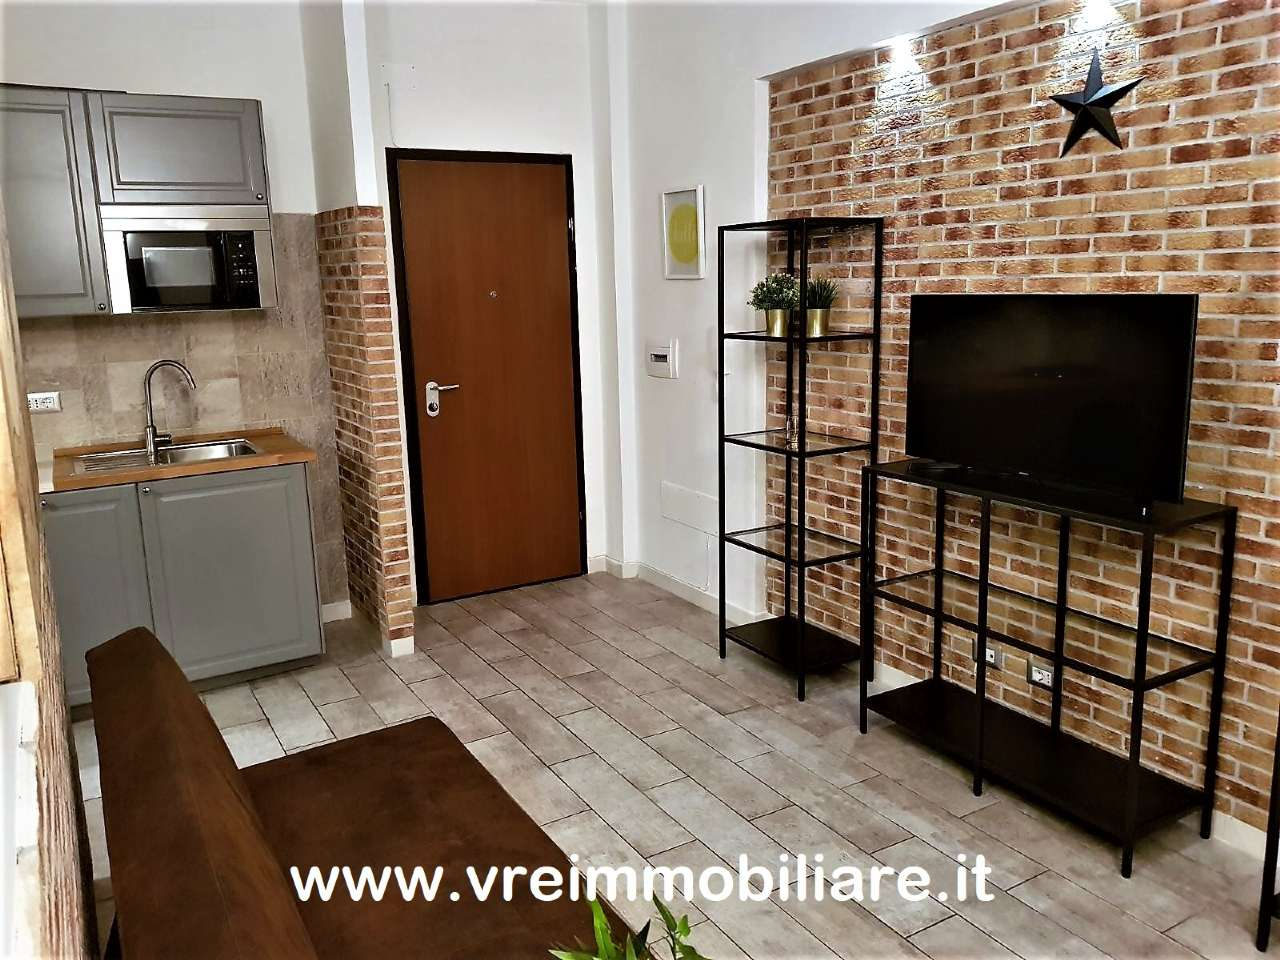 www.vreimmobiliare.it